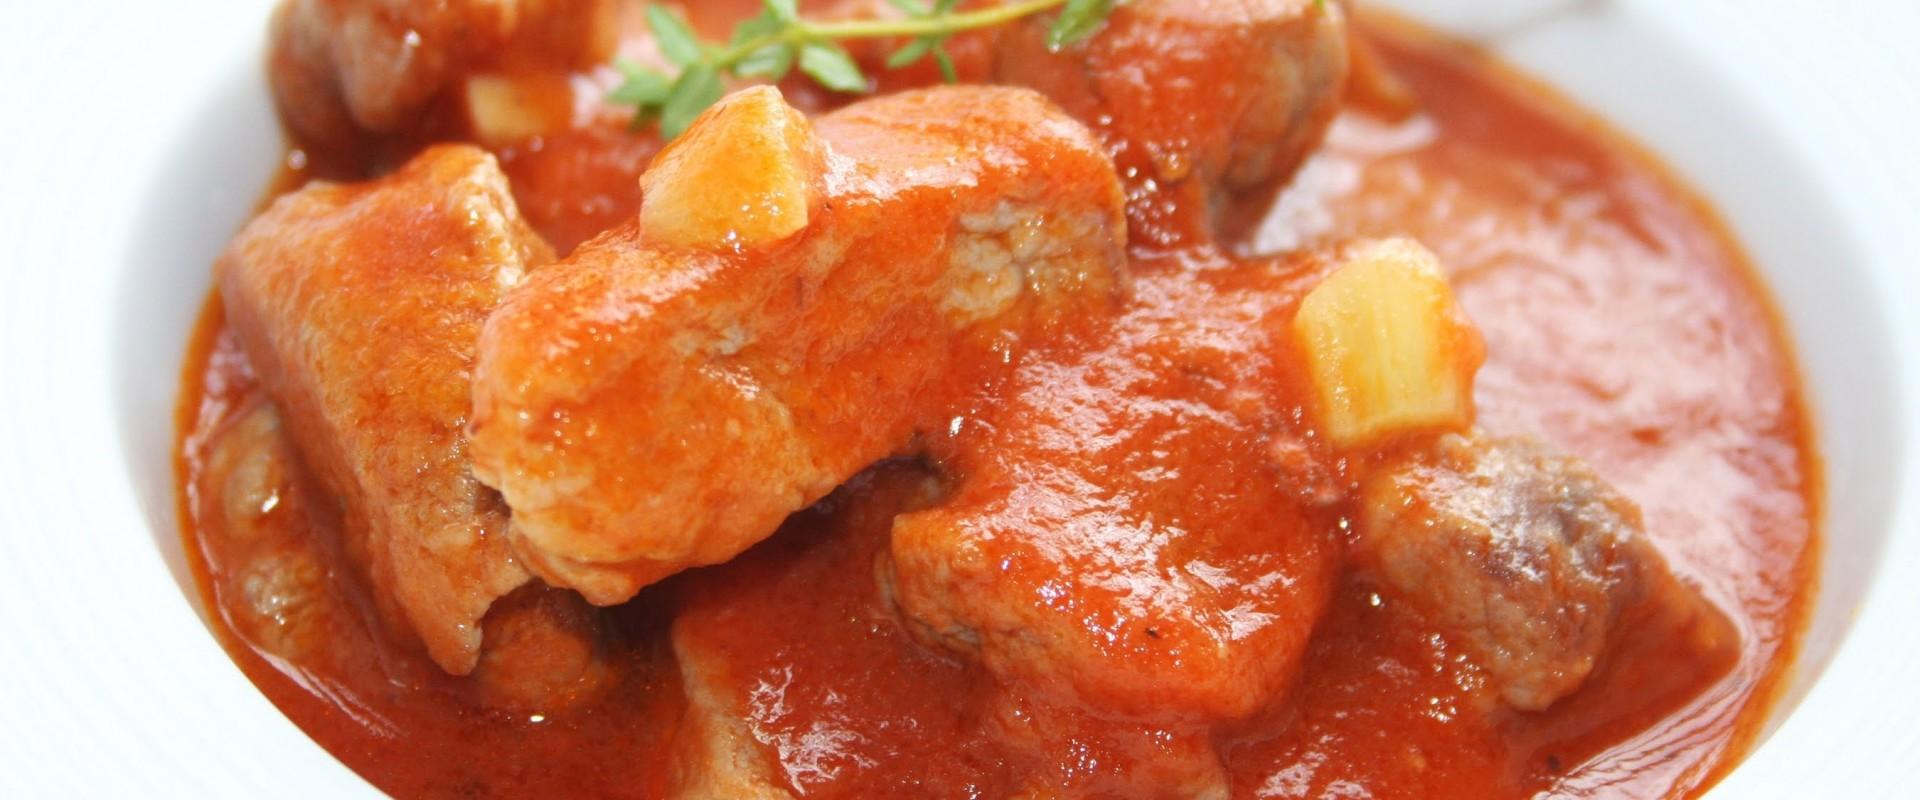 Magro con Tomate (Varkensvlees in tomatensaus)